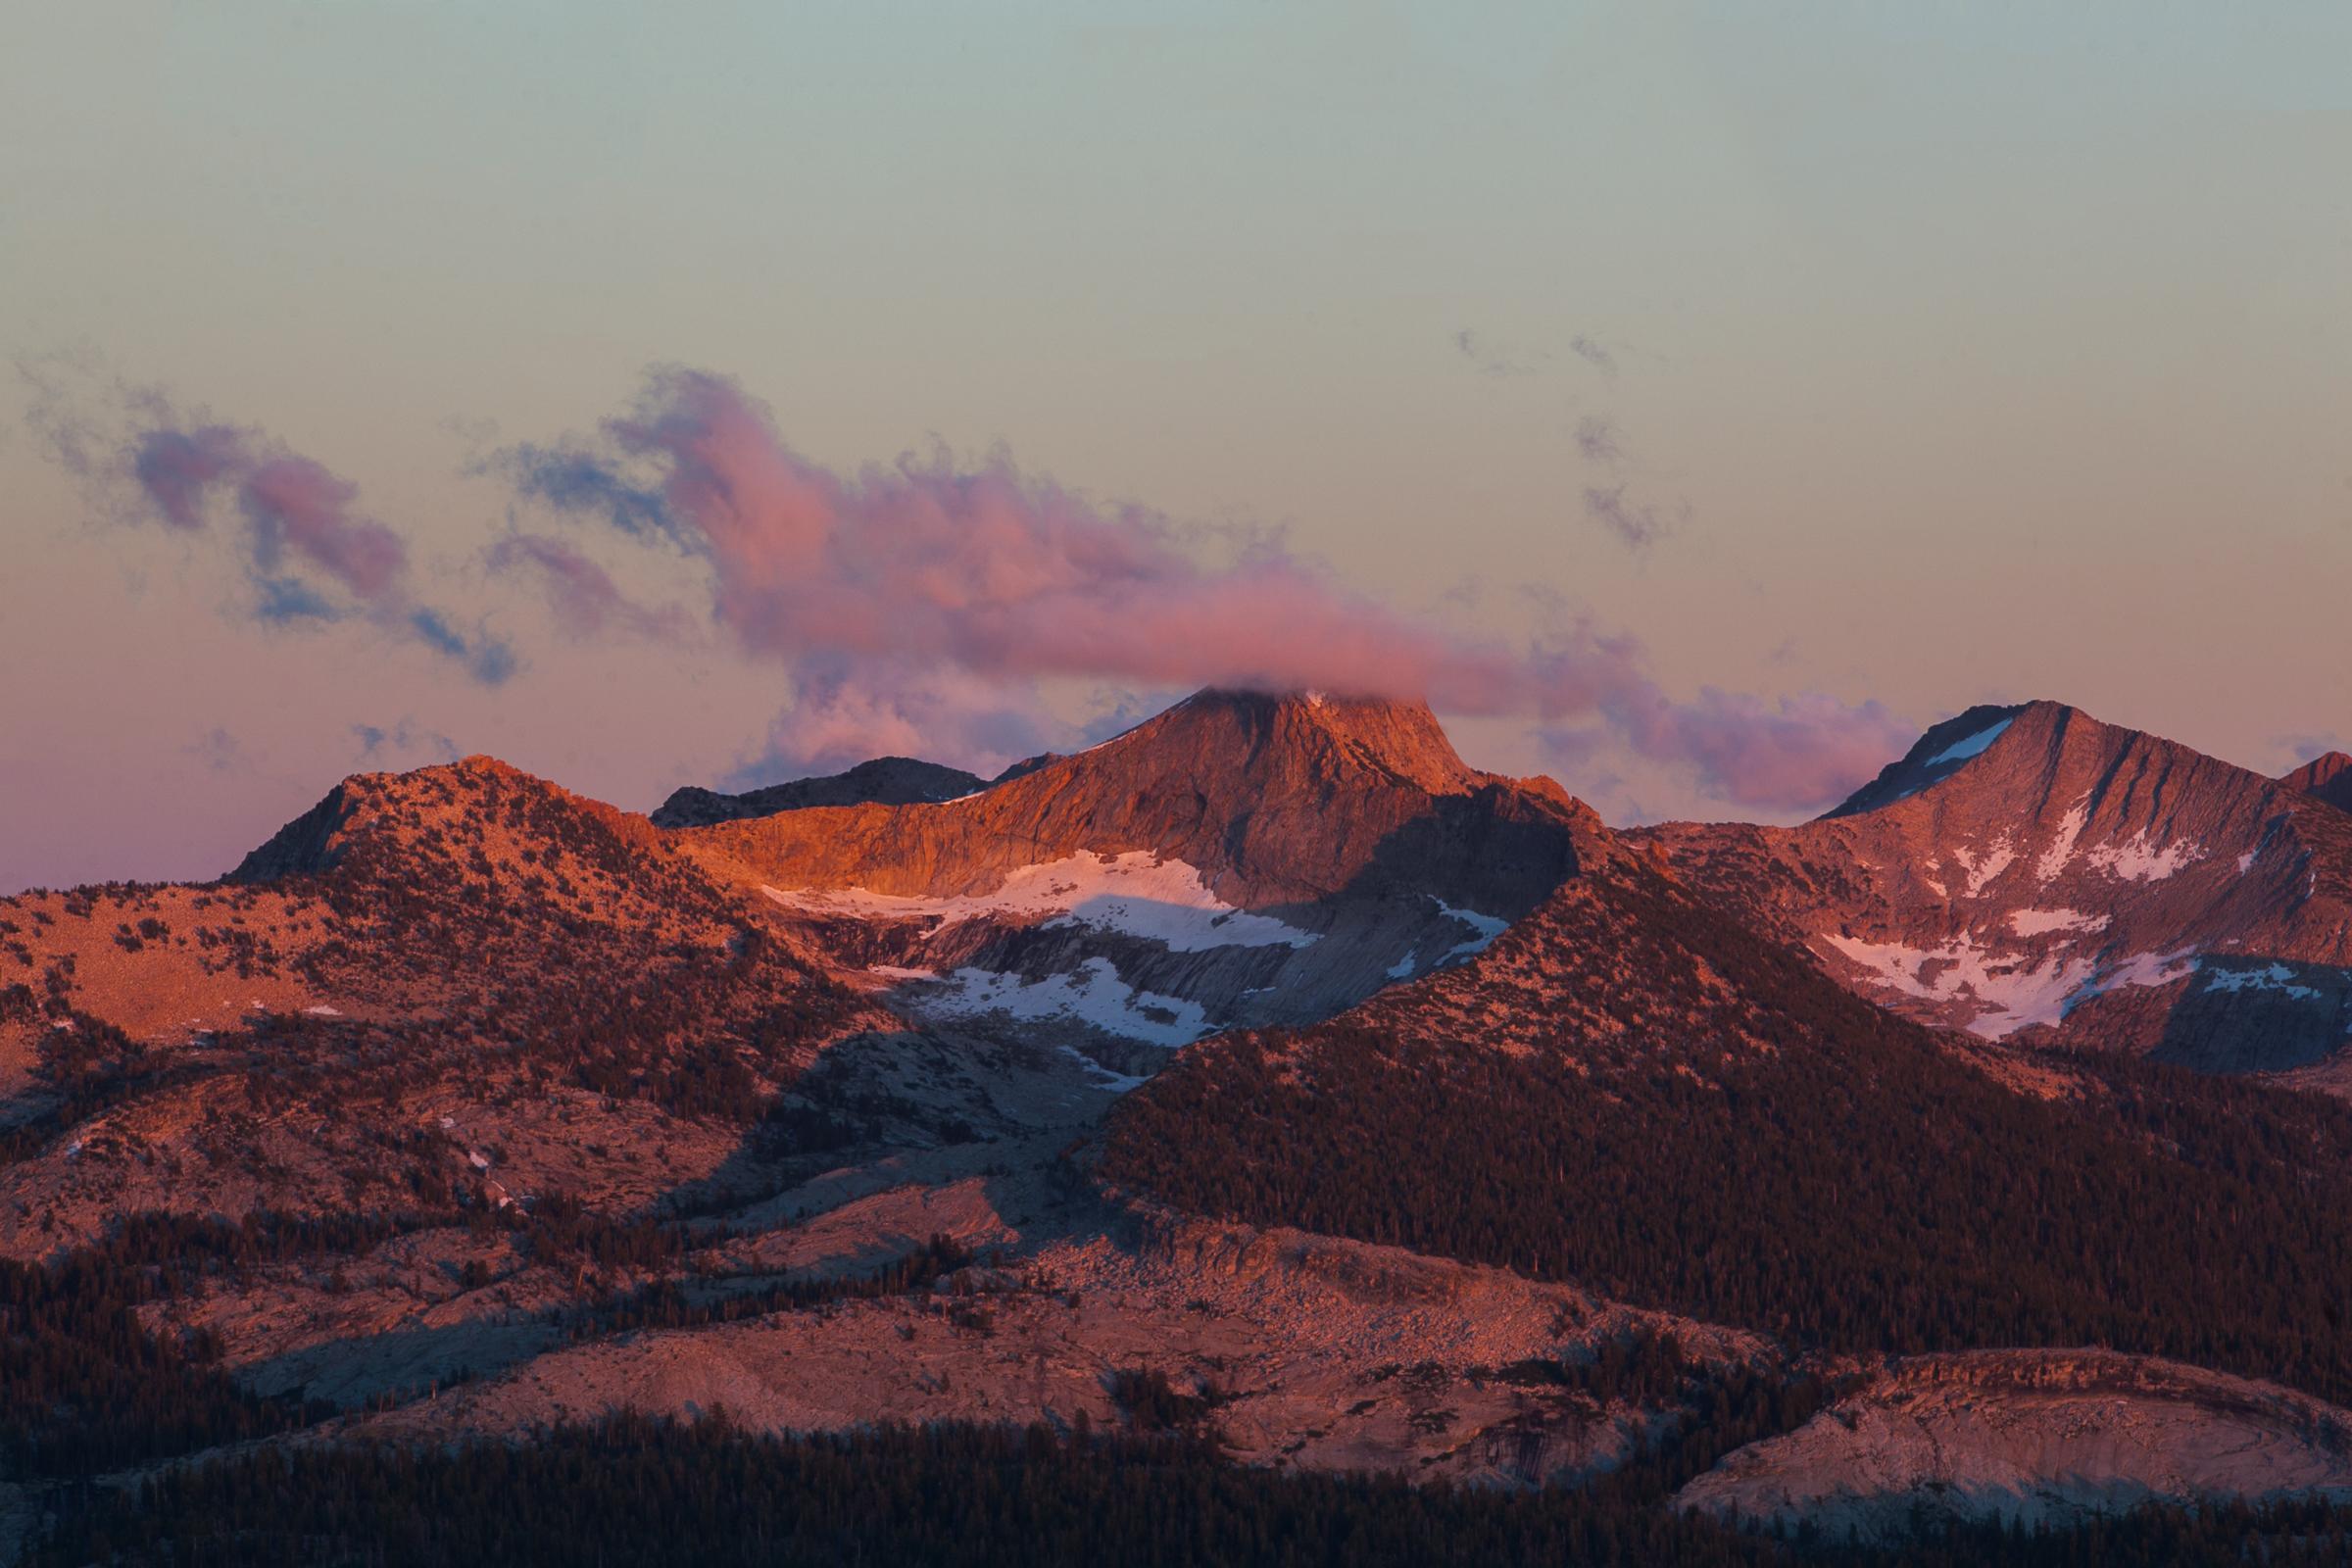 Burning Sierras